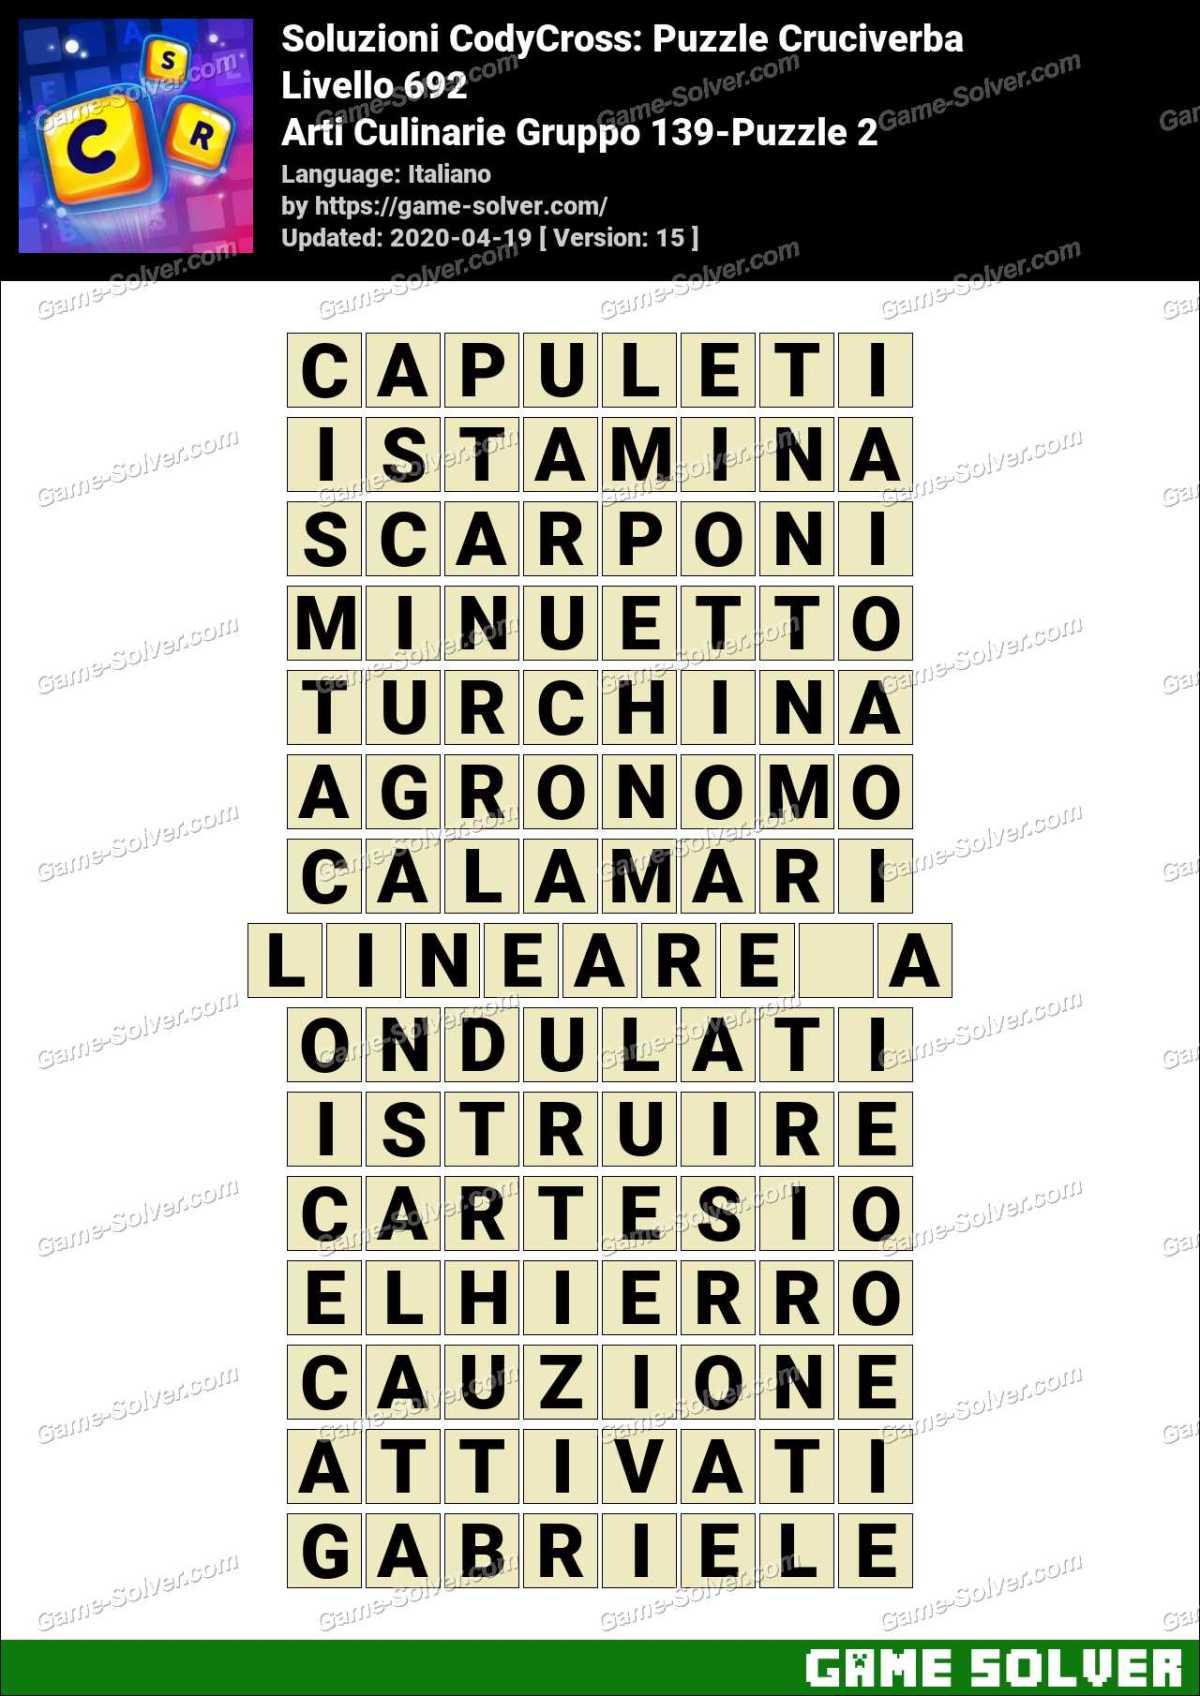 Soluzioni CodyCross Arti Culinarie Gruppo 139-Puzzle 2